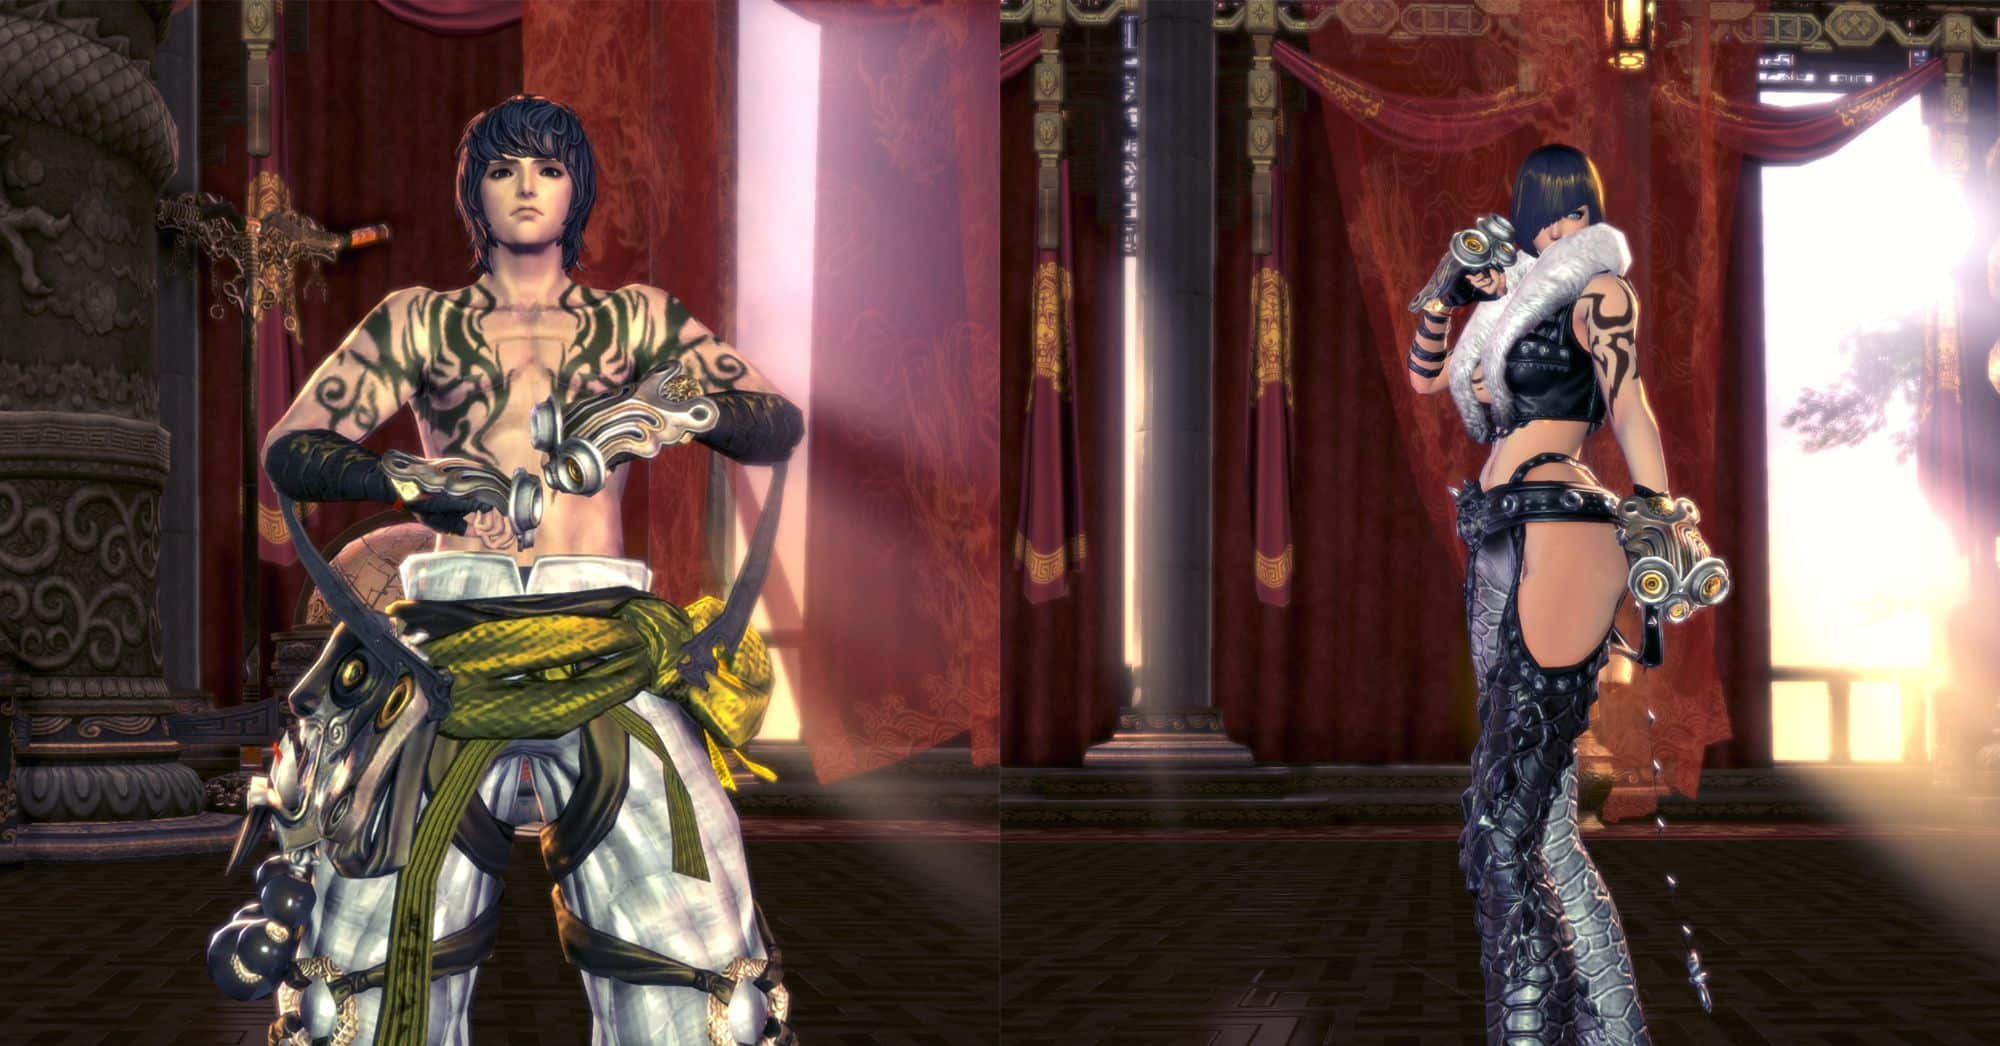 Kung Fu Master, Blade & Soul Class, Male Jin & Female Jin